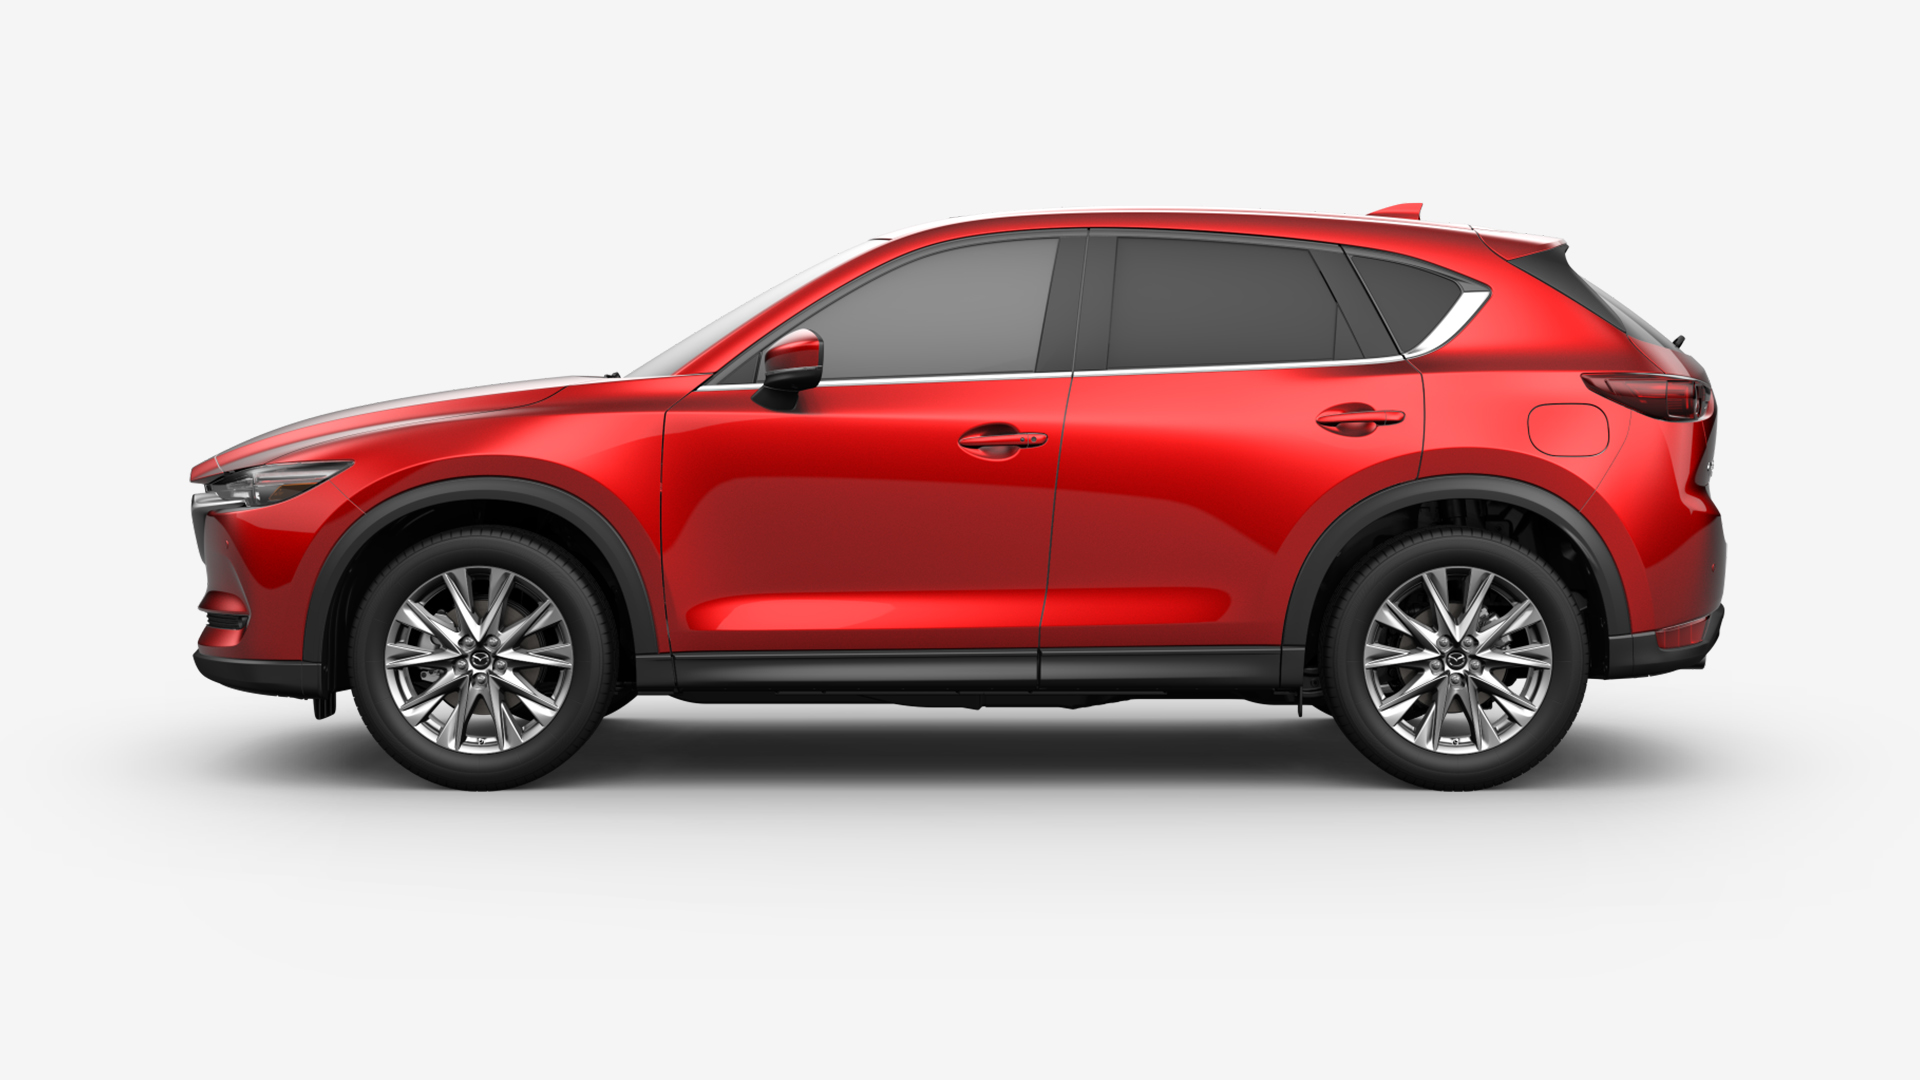 2018 Mazda CX-5: Redesign, Styling, Changes, Price >> 2019 Mazda Cx 5 Crossover Suv Fuel Efficient Suv Mazda Usa